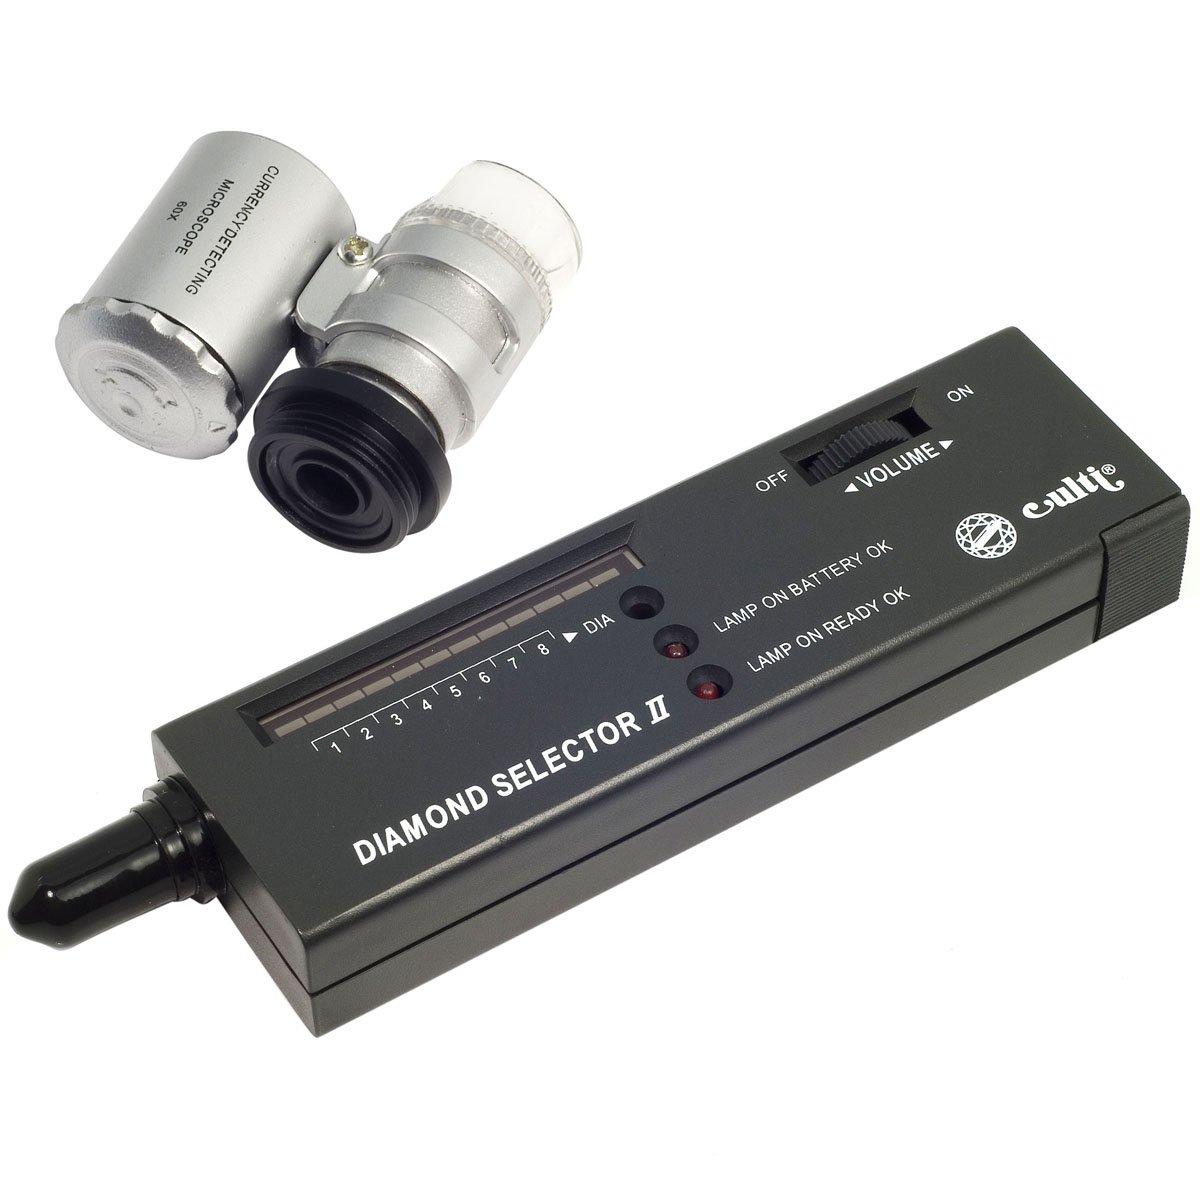 Tester Kit V2 Diamond Jewelery Selector Tool + Case +60 x Zoom Lens Loupe TE20 XCSource TE020